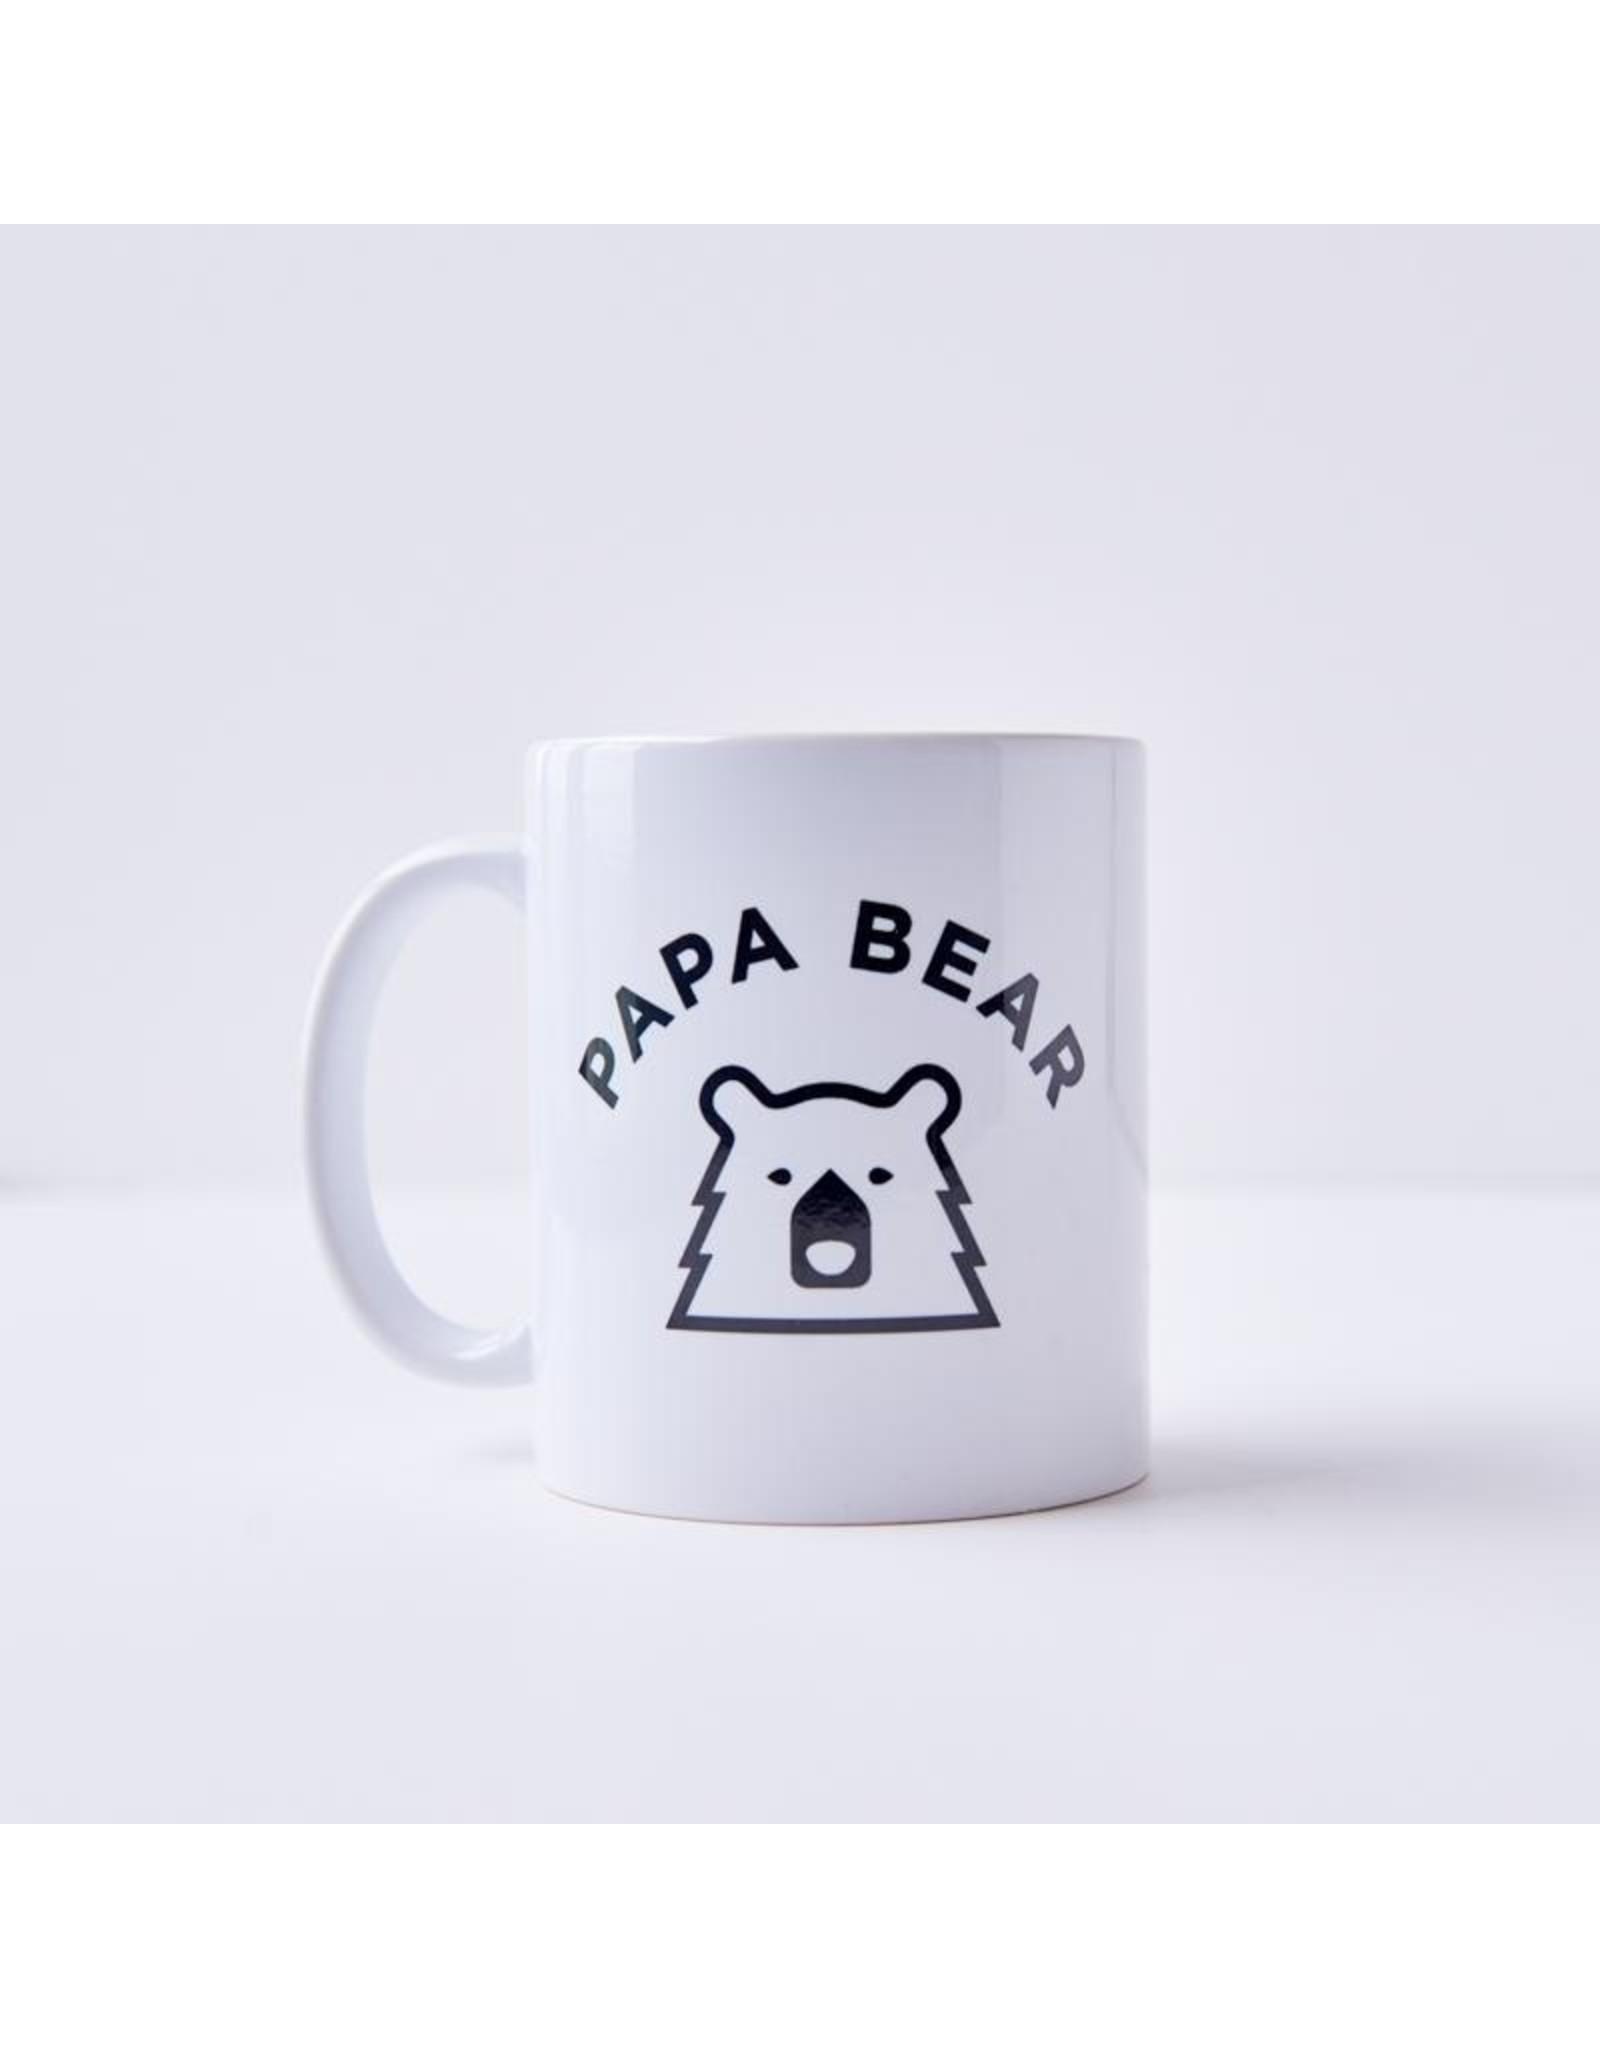 North Standard - Mug/Papa Bear